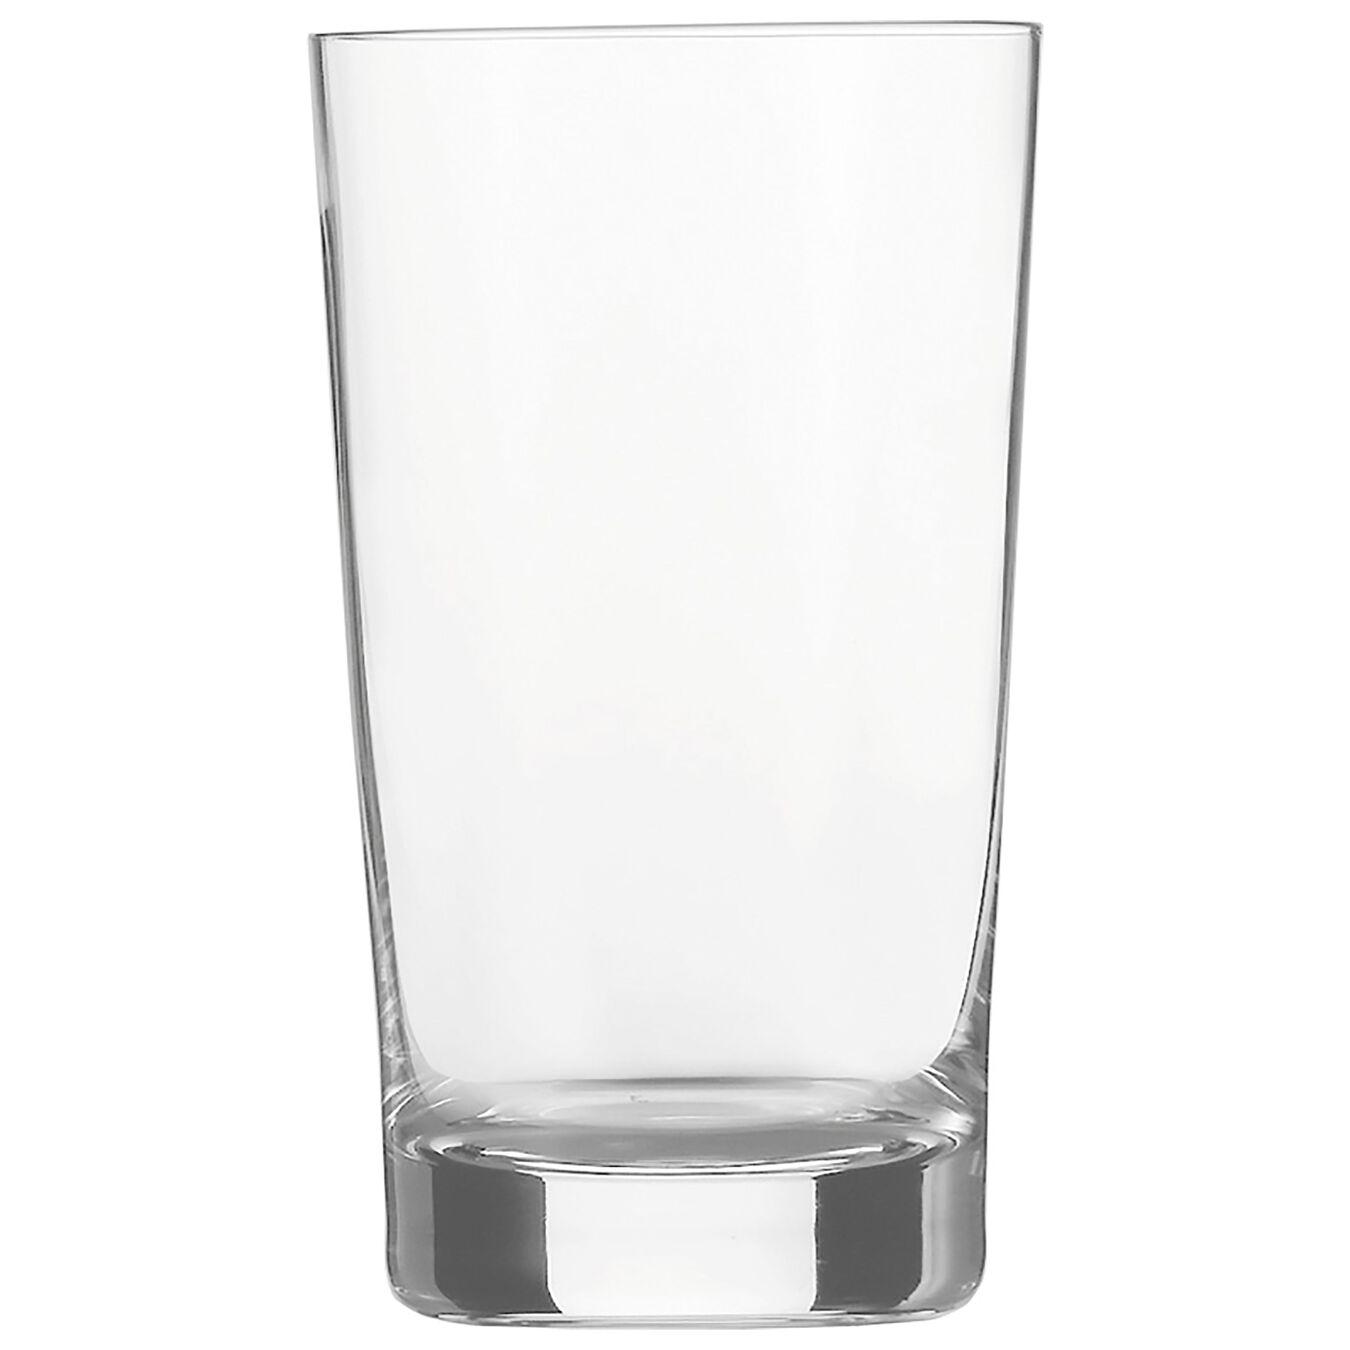 Copo para água e suco, 330 ml,,large 1